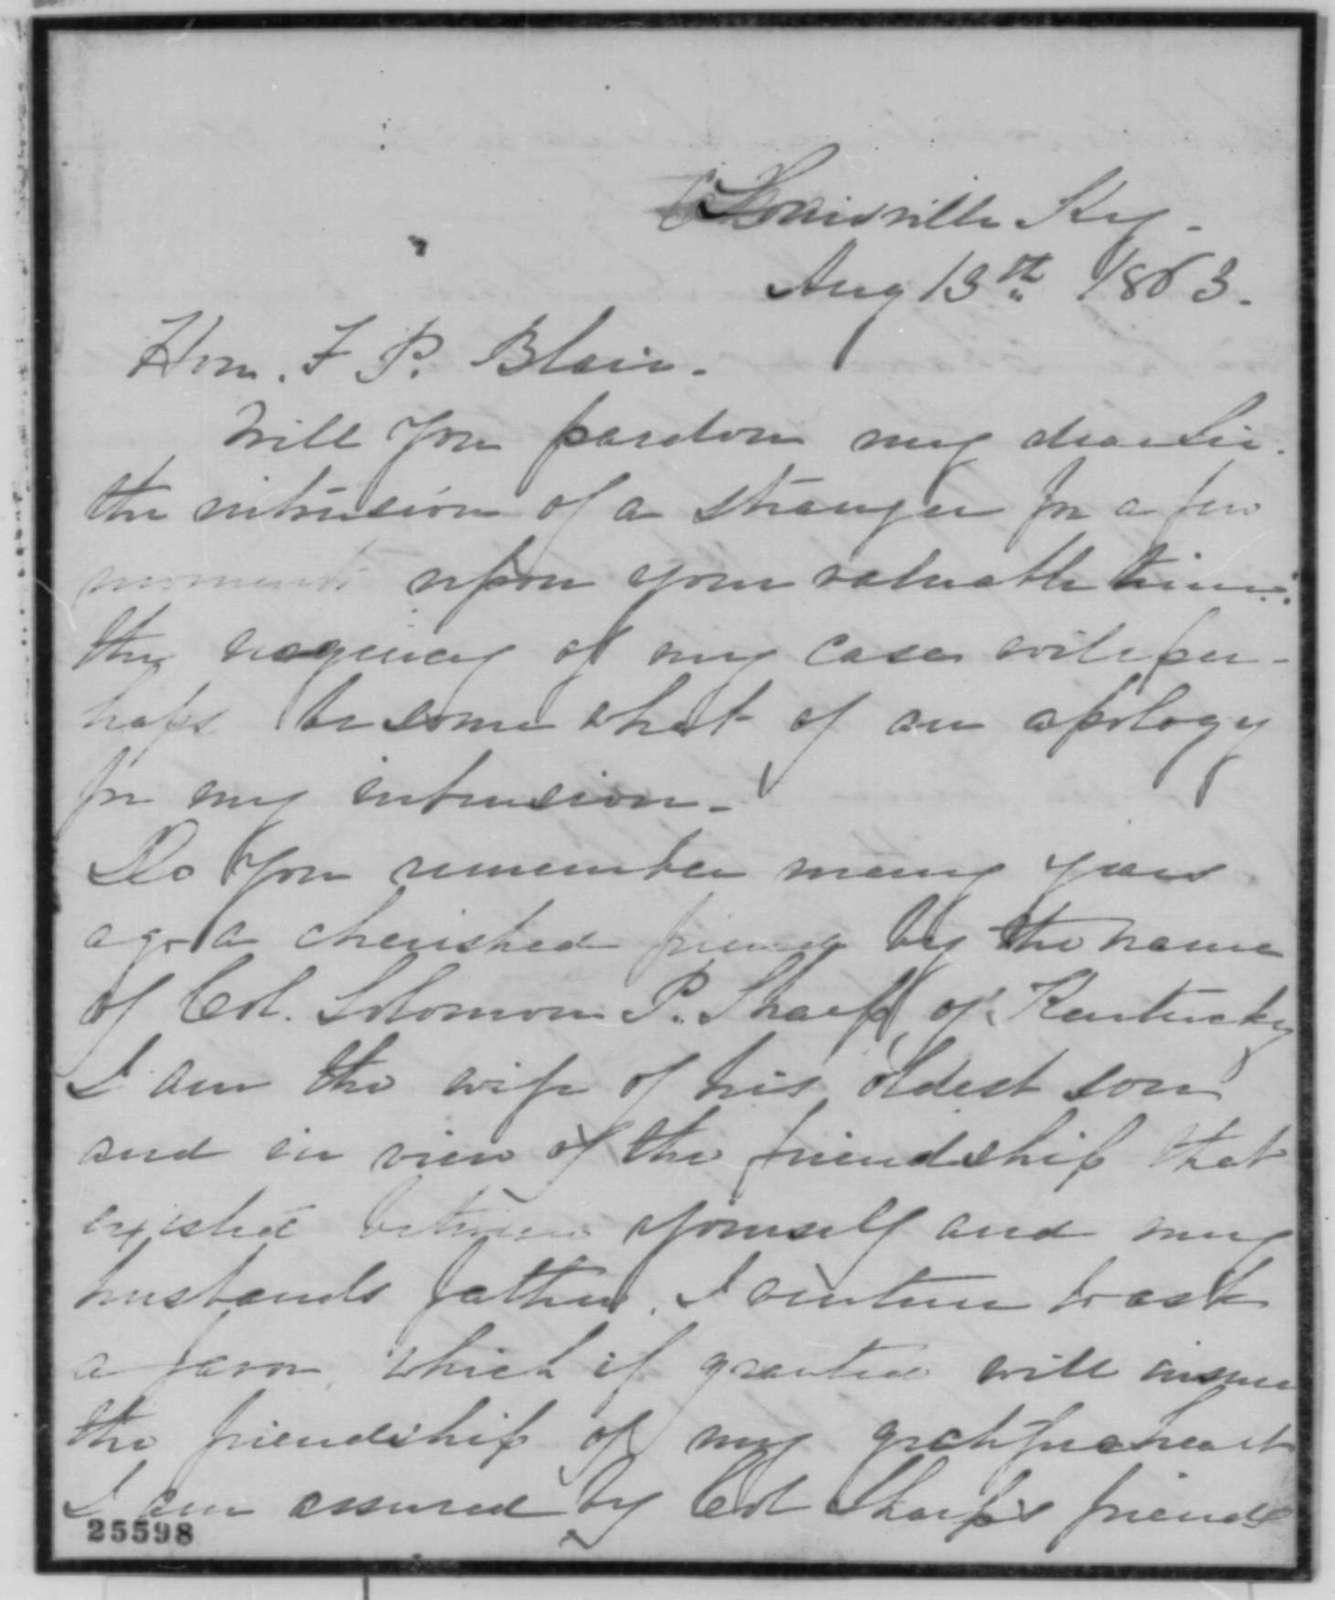 Mrs. John M. Sharpe to Francis P. Blair Sr., Thursday, August 13, 1863  (Seeks pass to travel to Confederacy)